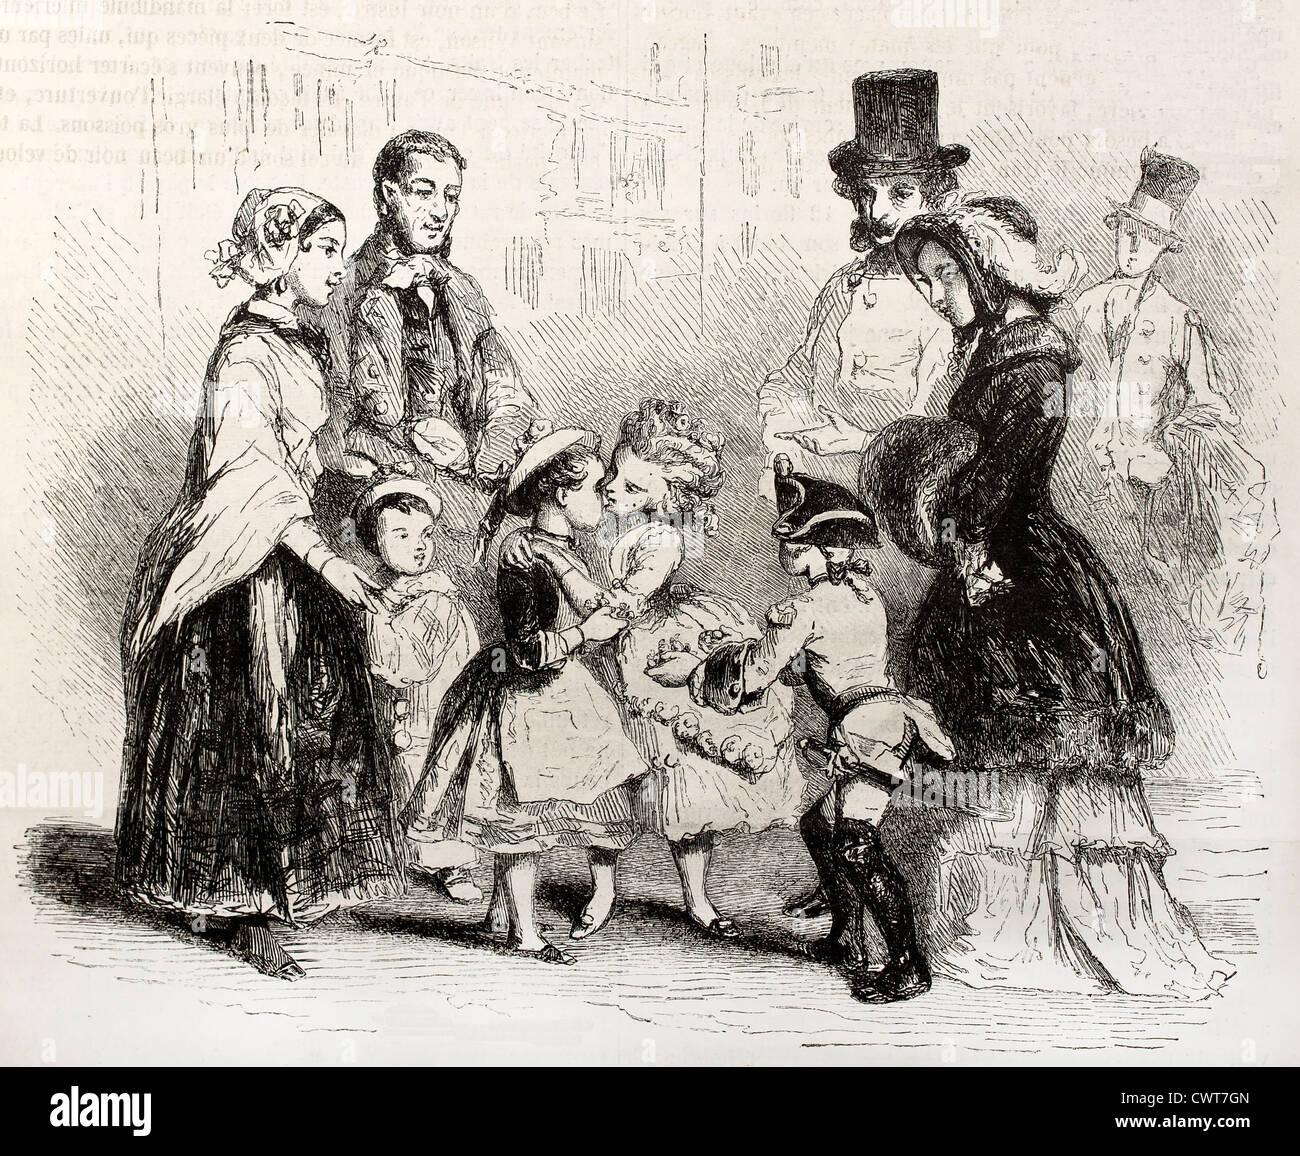 Old illustration of two children kissing - Stock Image